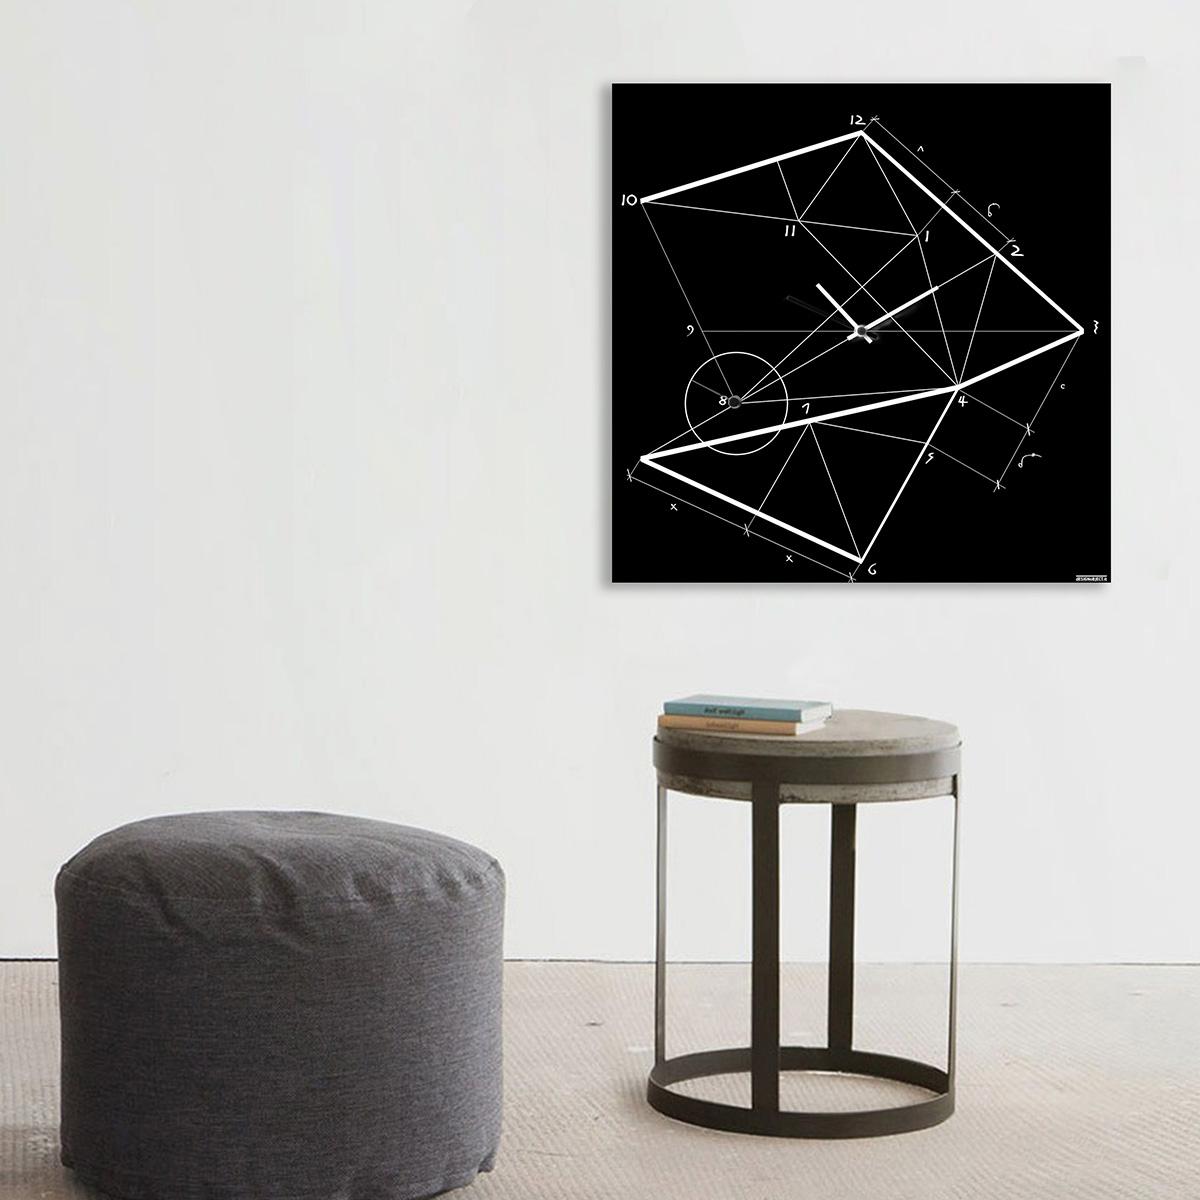 orologio-parete-design-wall-clock-mood-time-line-black